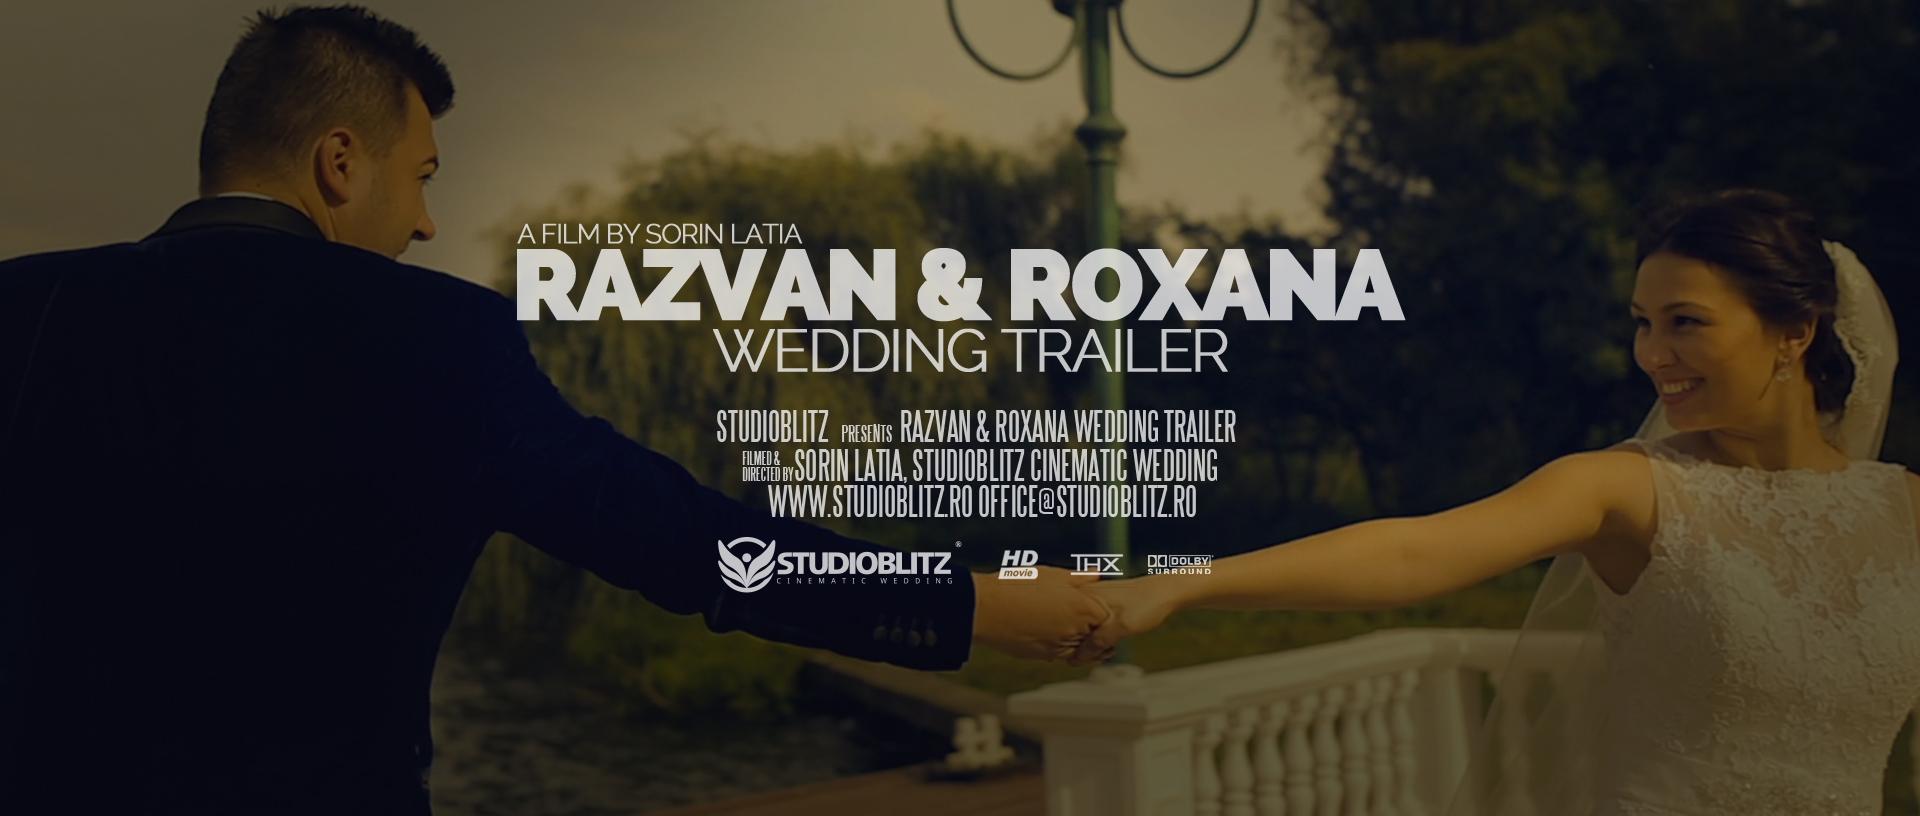 coperta-filmari-nunti-bucuresti-razvan-roxana-wedding-trailer